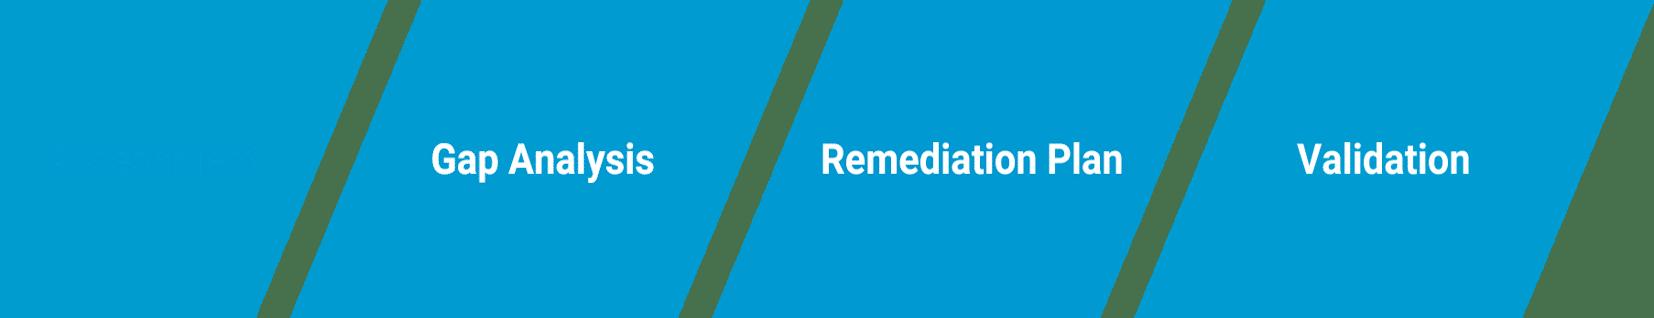 Assessment Gap Analysis Remediation Plan Validation